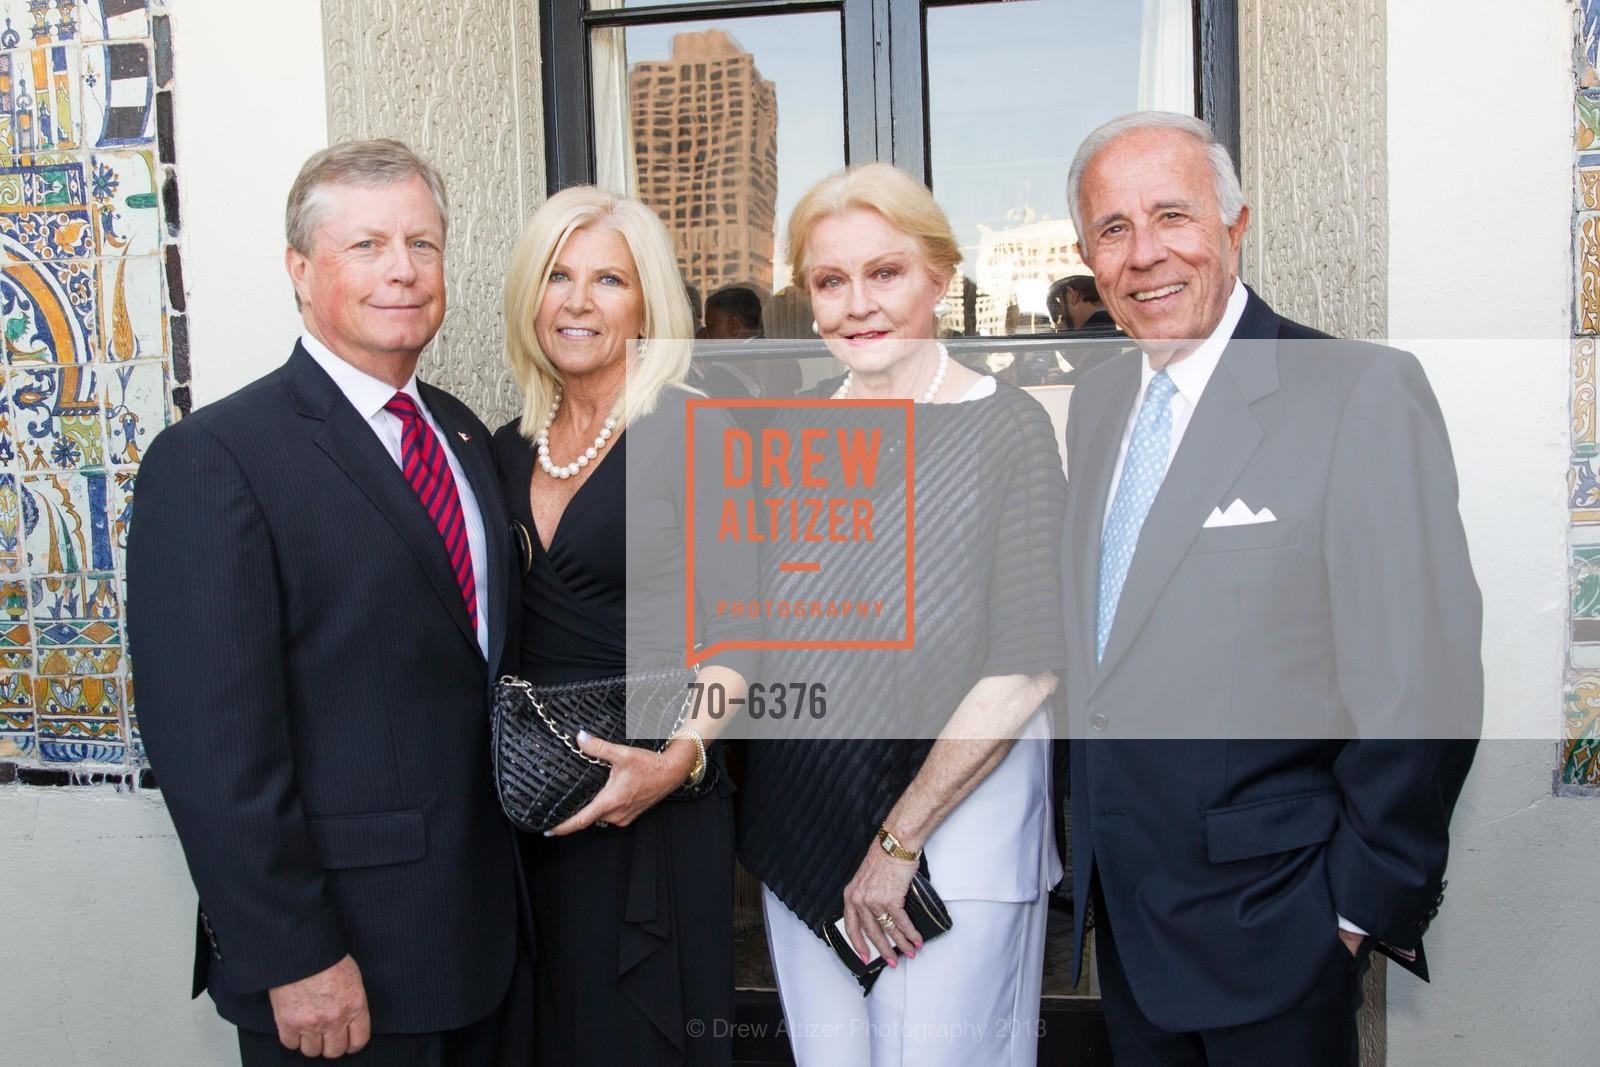 Scott Trommer, Melissa Trommer, Ginnie Koulos, Leo Koulos, COAST GUARD FOUNDATION Presents Pacific Awards Dinner, US, April 25th, 2013